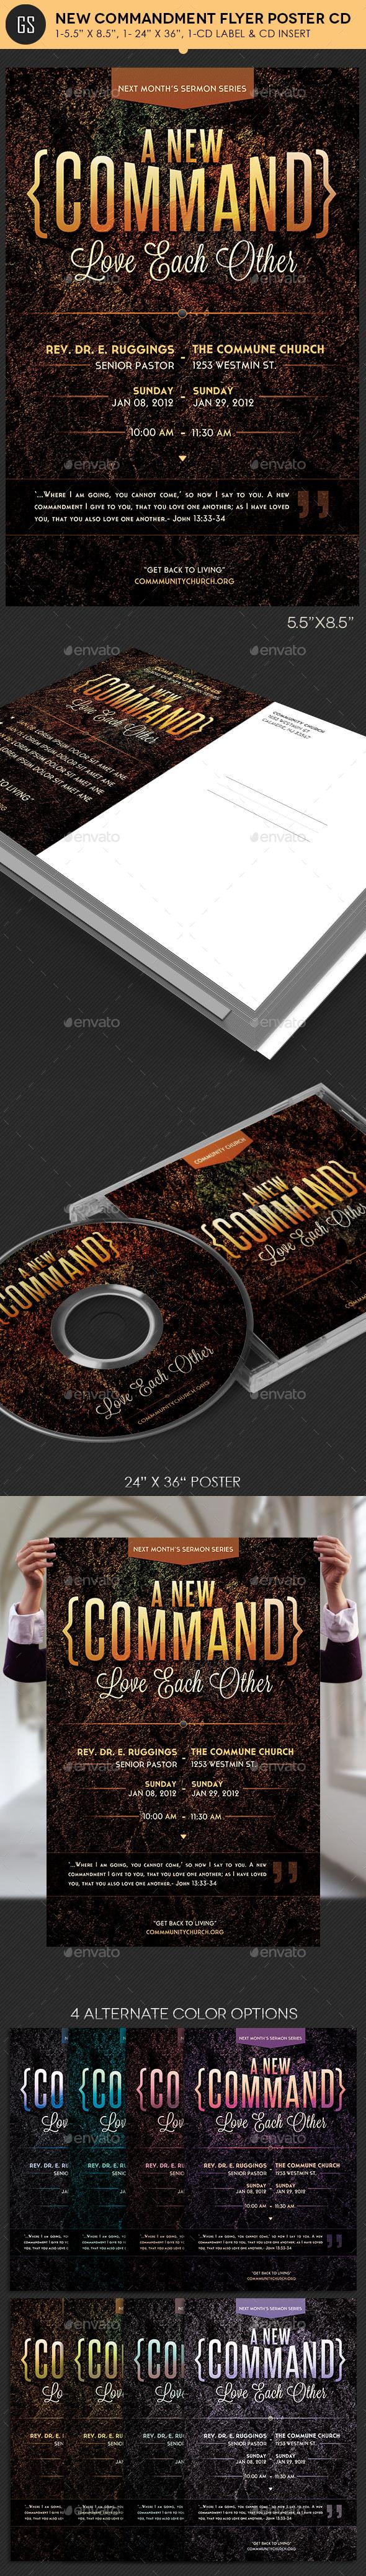 New Commandment Flyer Poster CD Template - Church Flyers